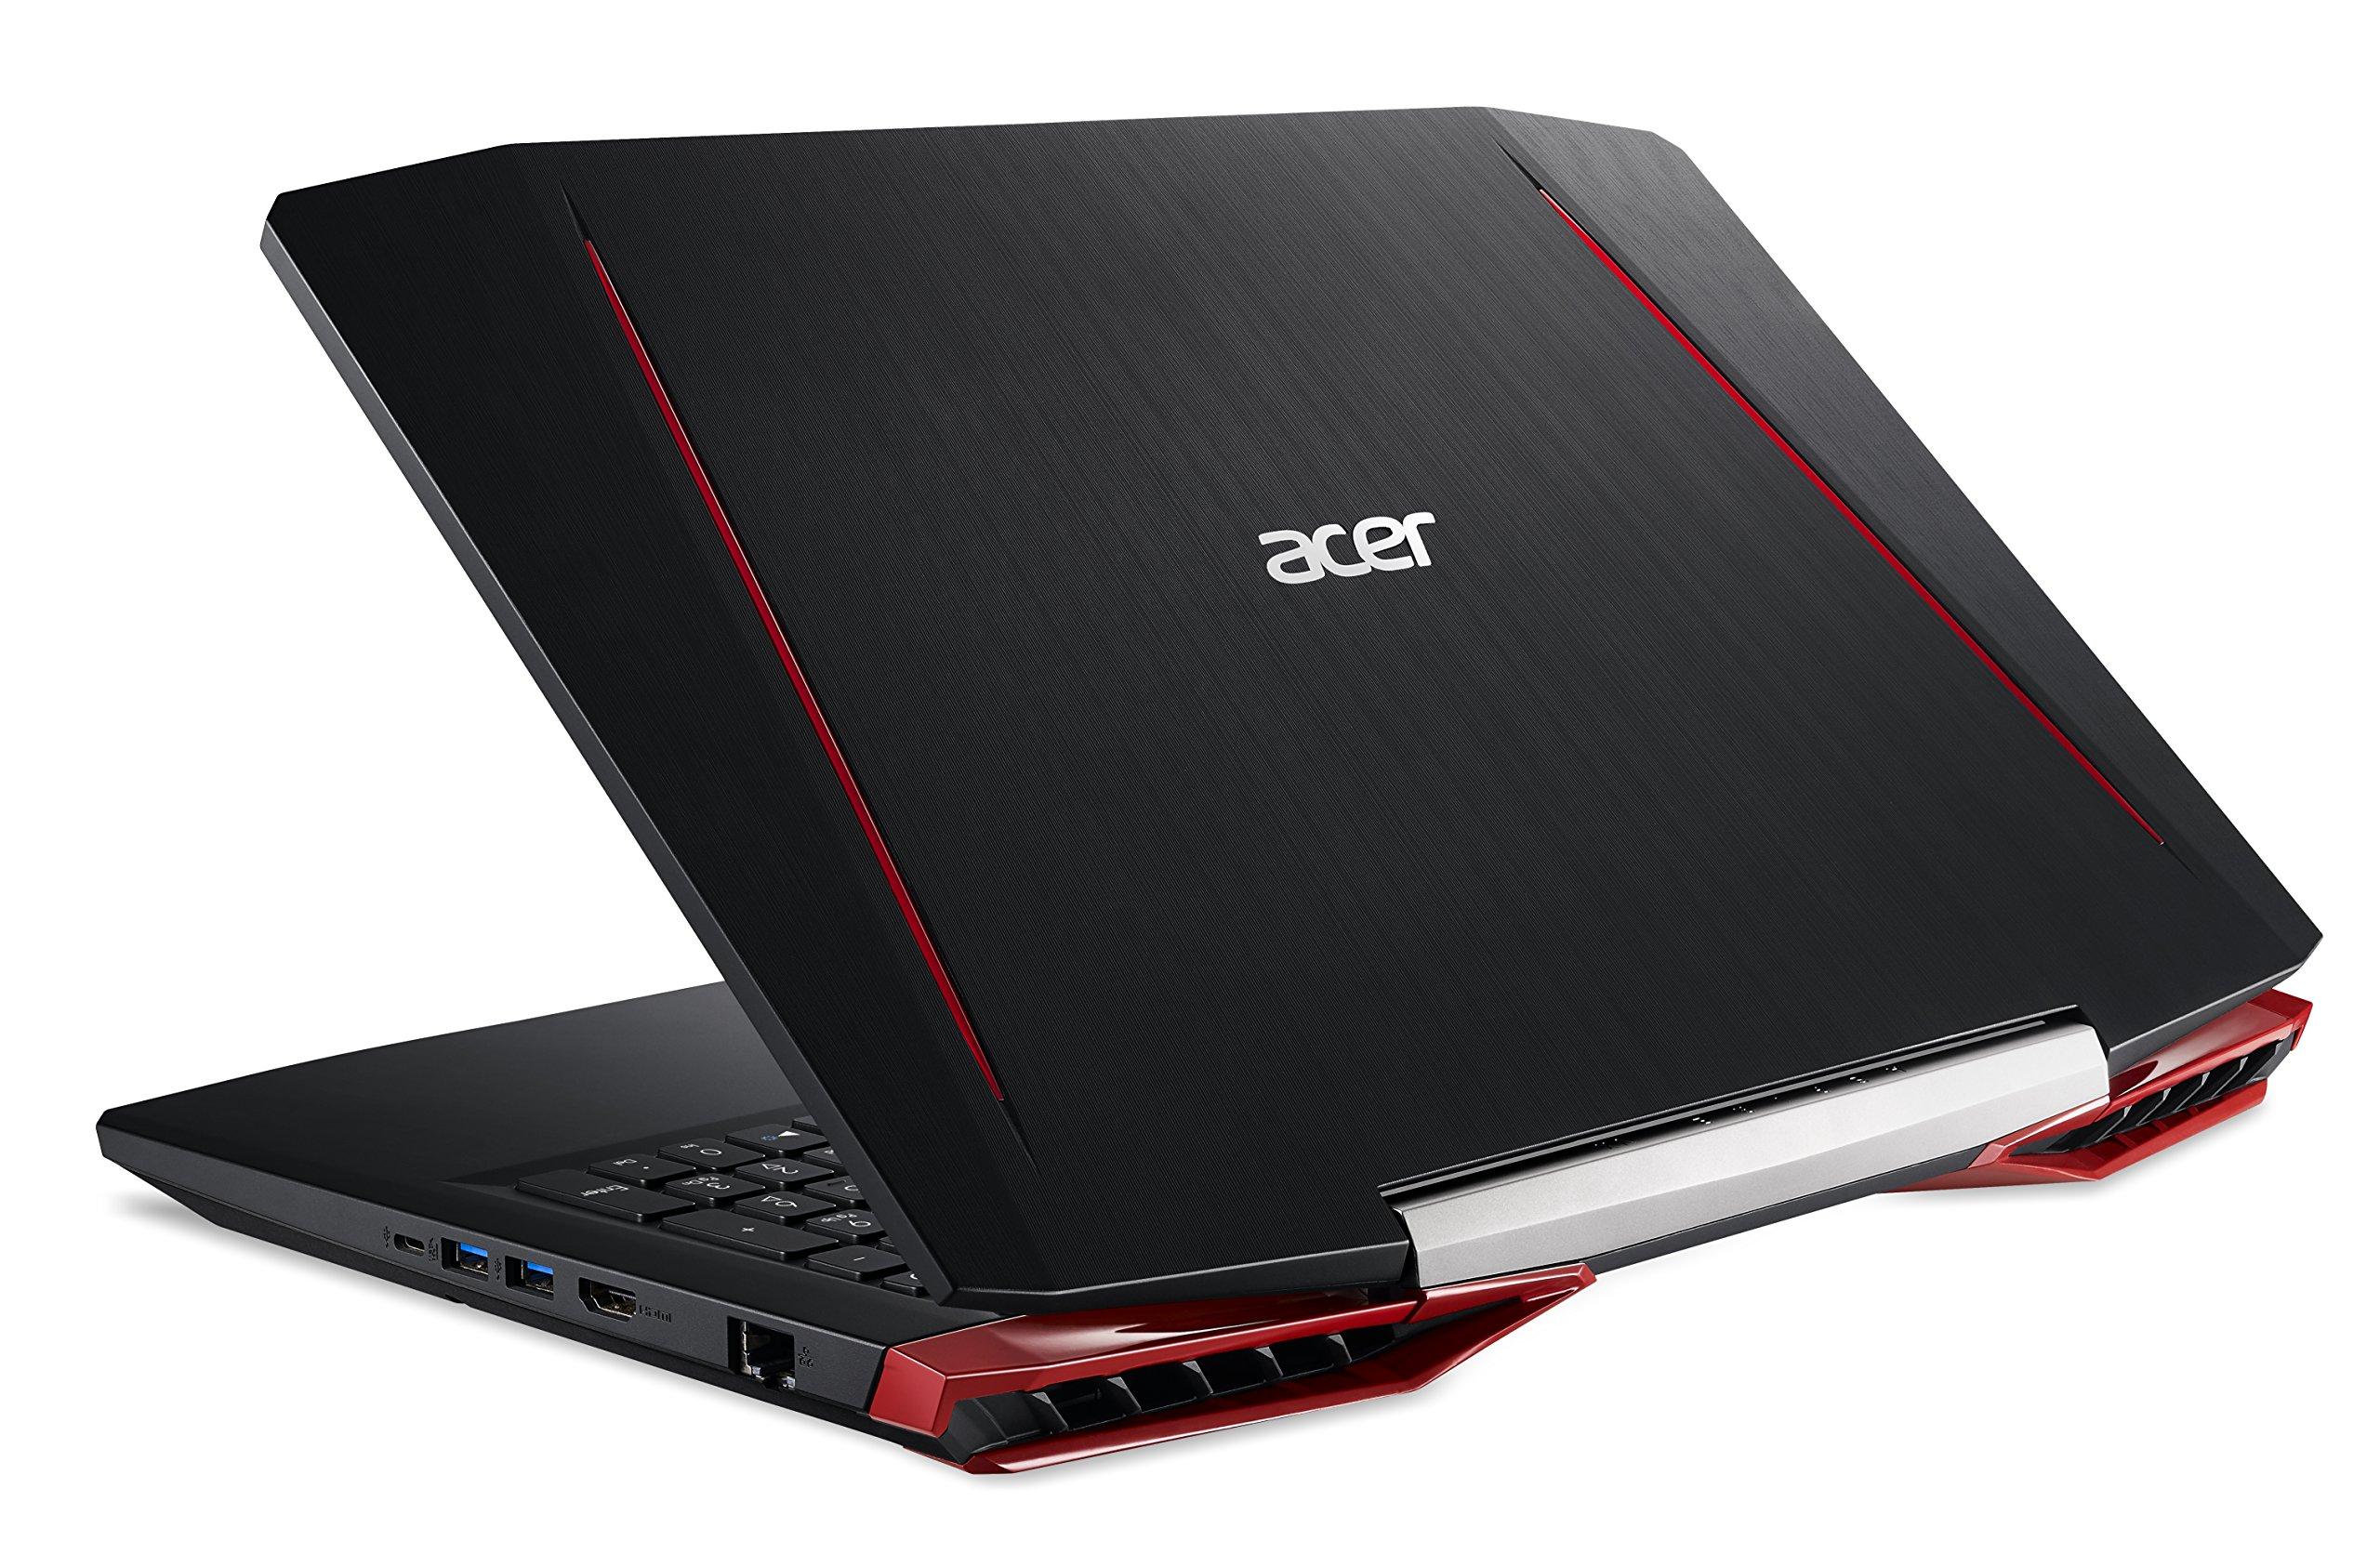 Acer Aspire VX 15 Gaming Laptop, 7th Gen Intel Core i7, NVIDIA GeForce GTX 1050 Ti, 15.6 Full HD, 16GB DDR4, 256GB SSD, VX5-591G-75RM by Acer (Image #4)